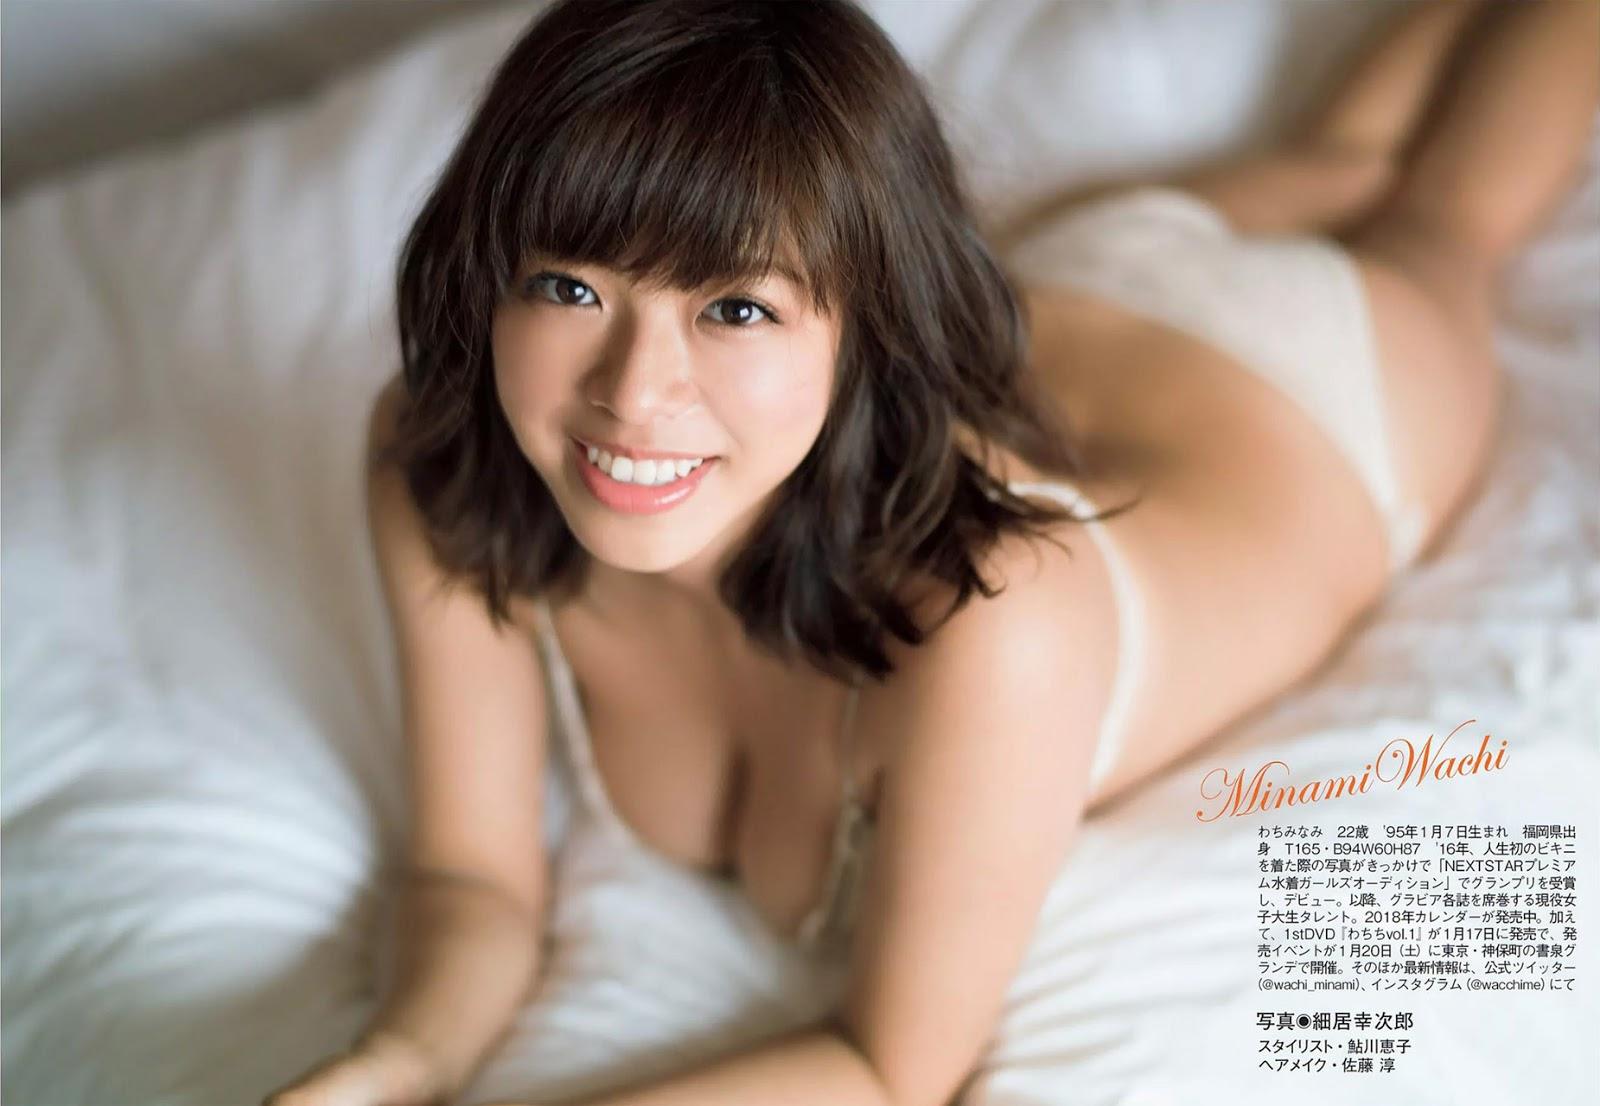 Minami Wachi わちみなみ, FLASH 電子版 2017.12.19 (フラッシュ 2017年12月19日号)